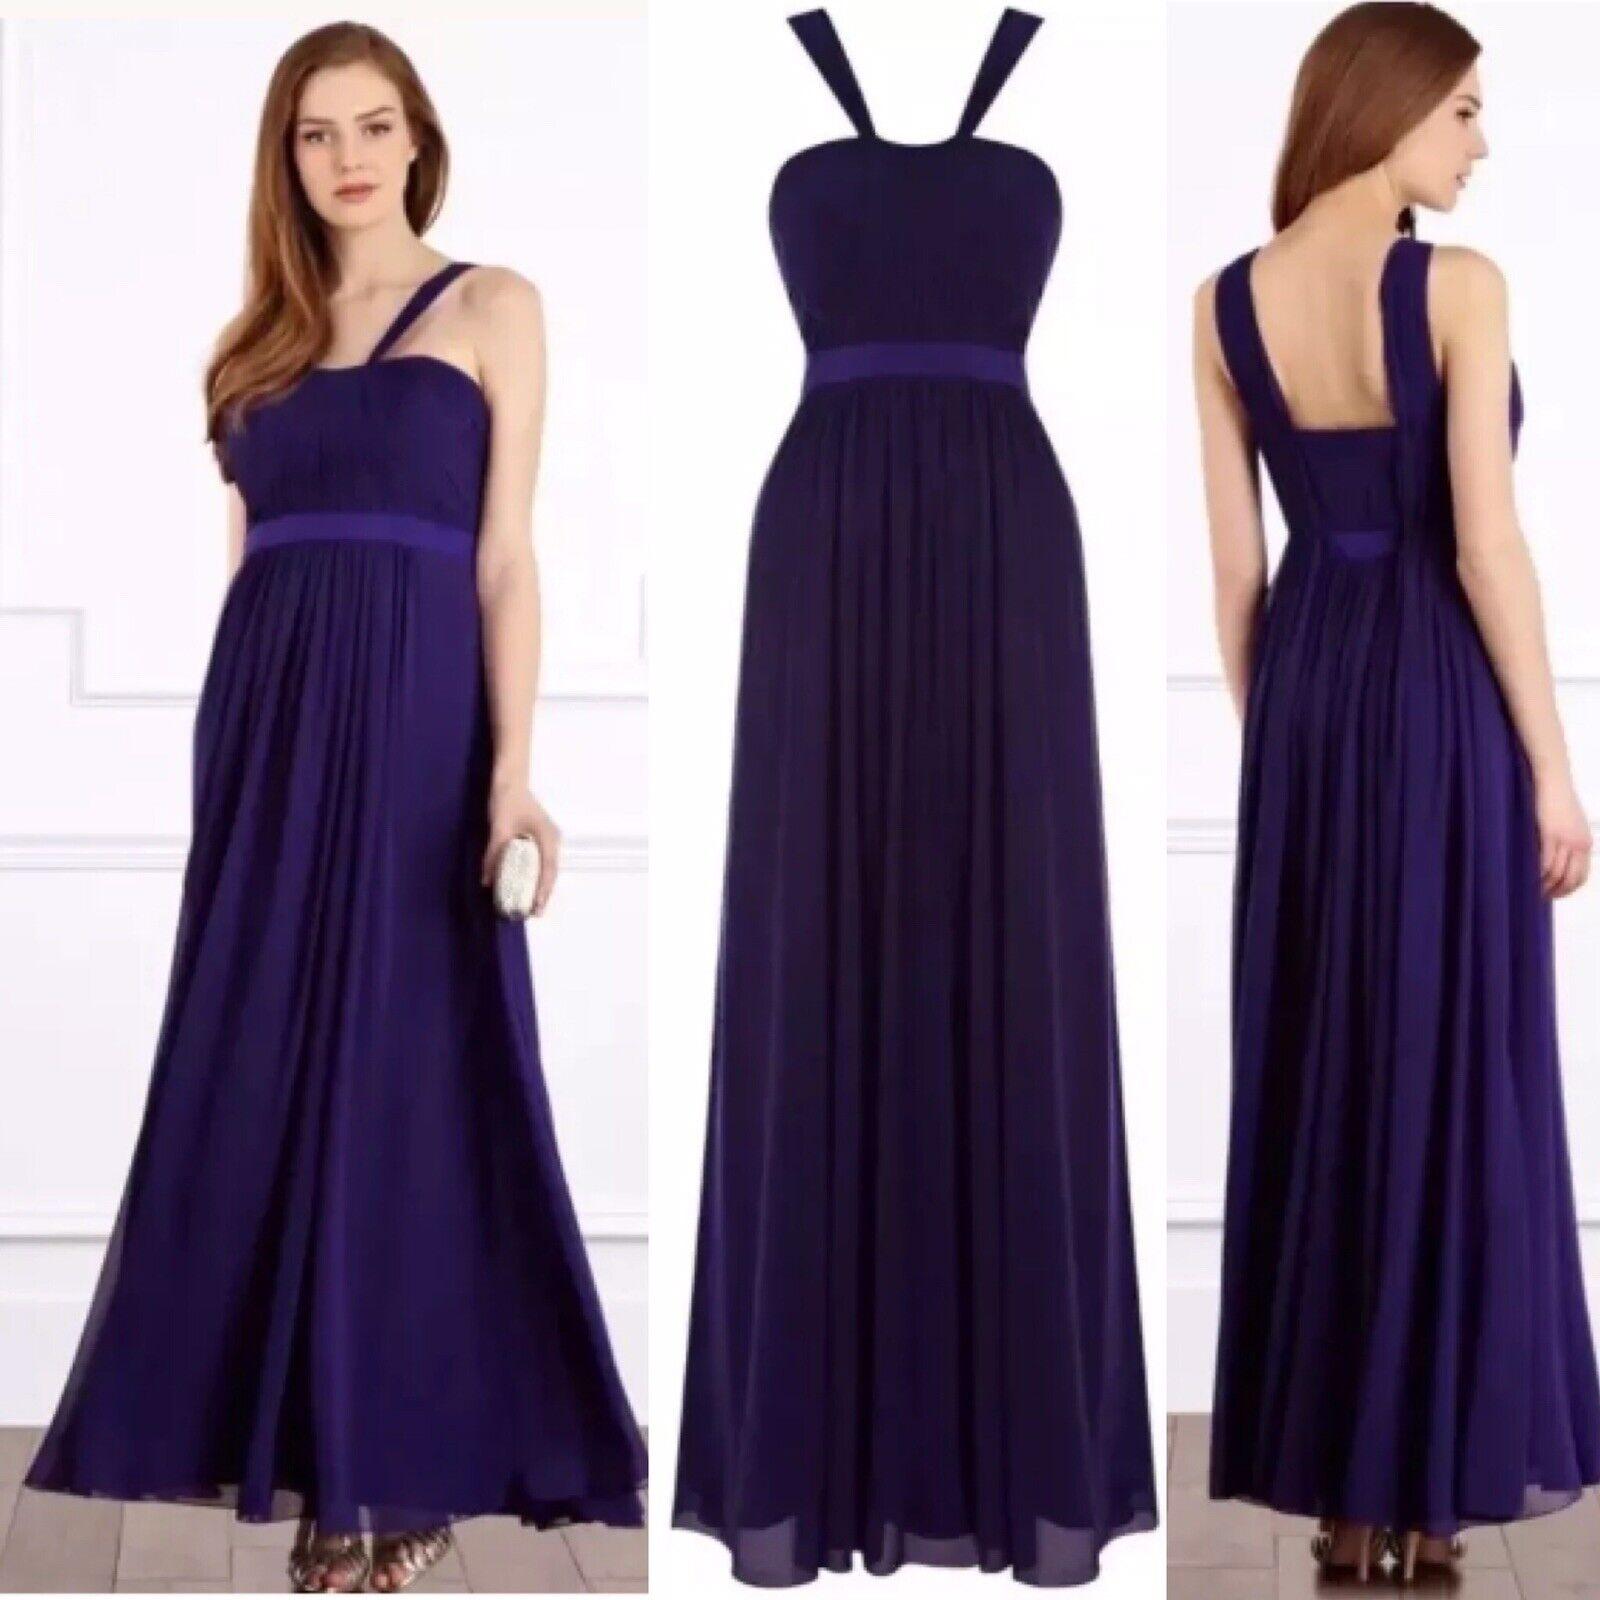 Coast Icona Maxi lila Prom Ballgown Bridesmaid Grecian Long Dress 16 RRP